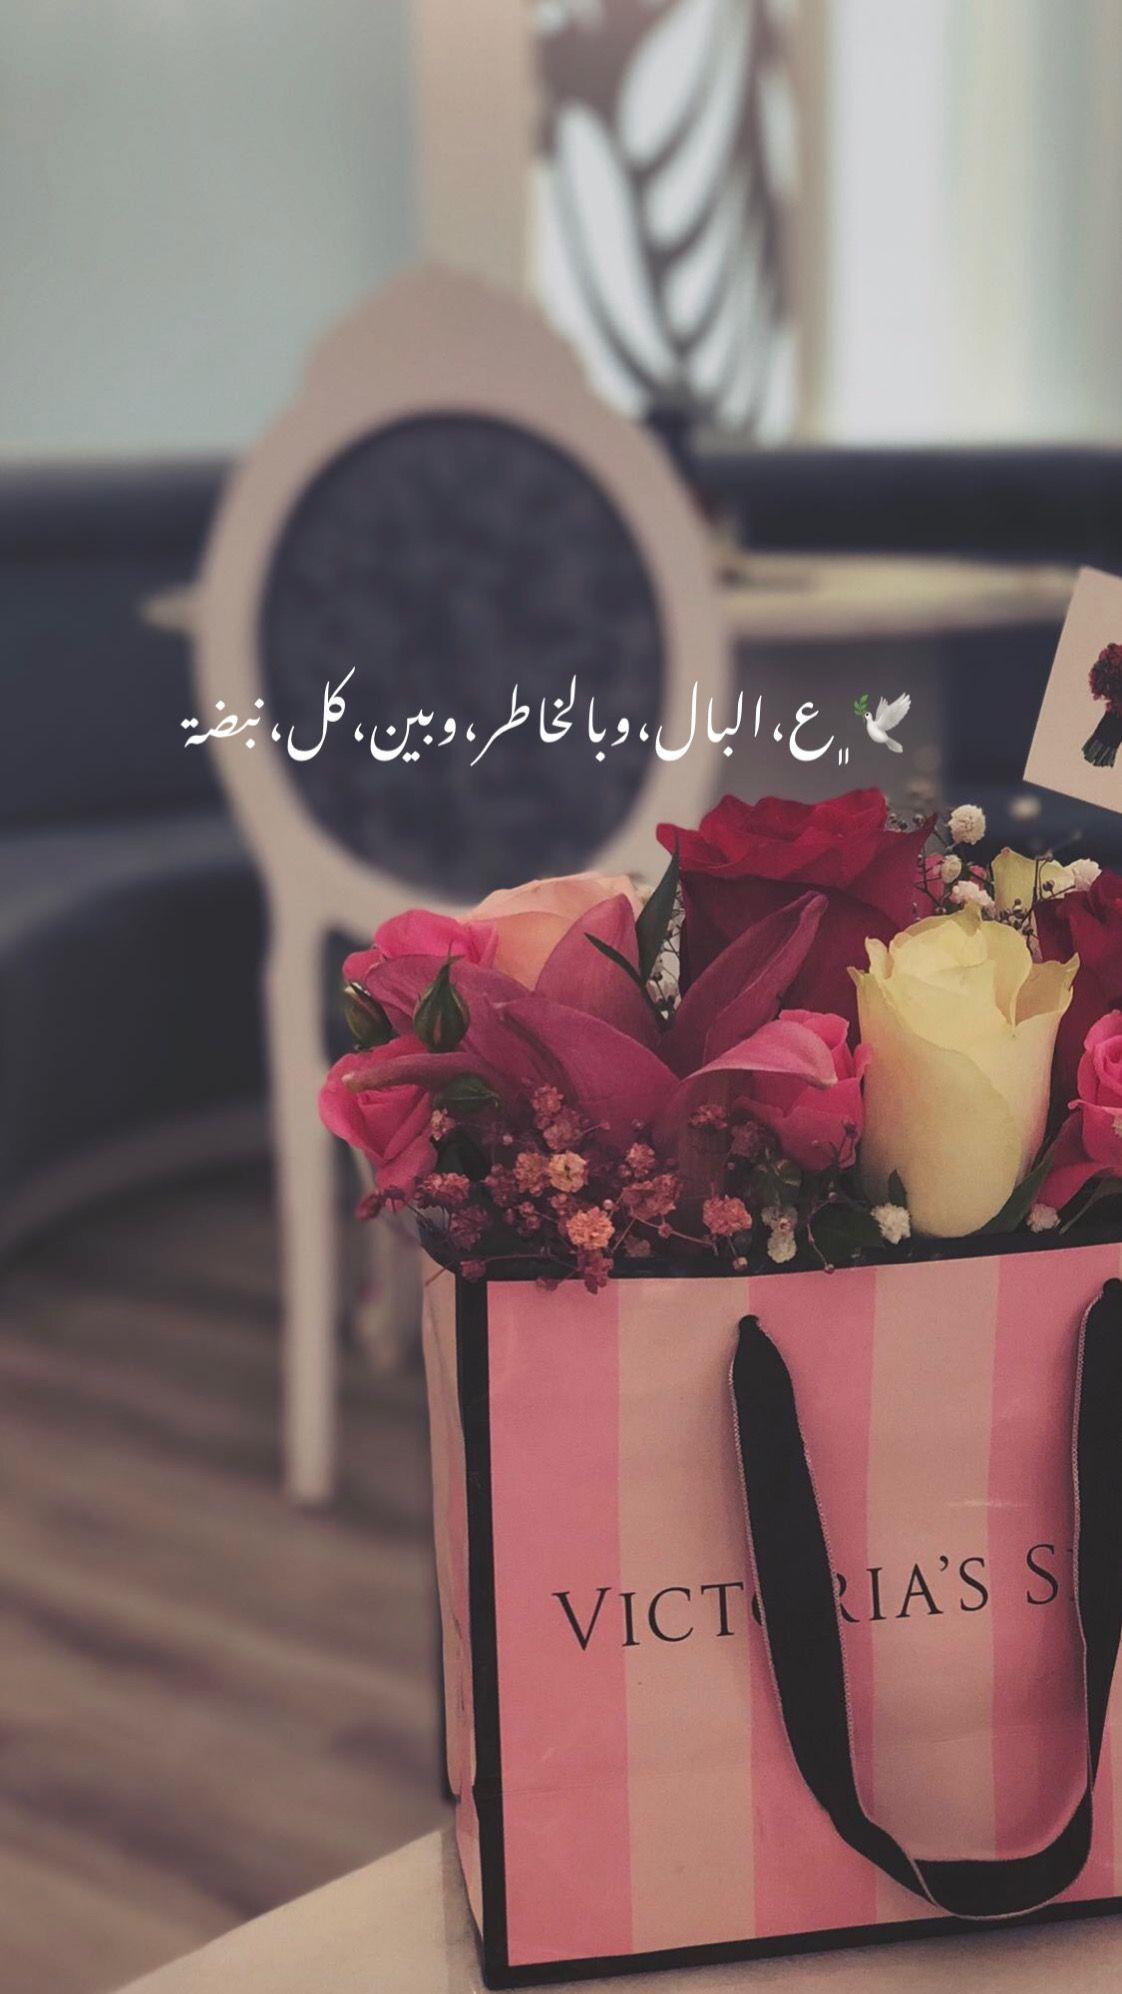 Victoria Secret Arabic Quotes Love Quotes Wallpaper Beautiful Arabic Words